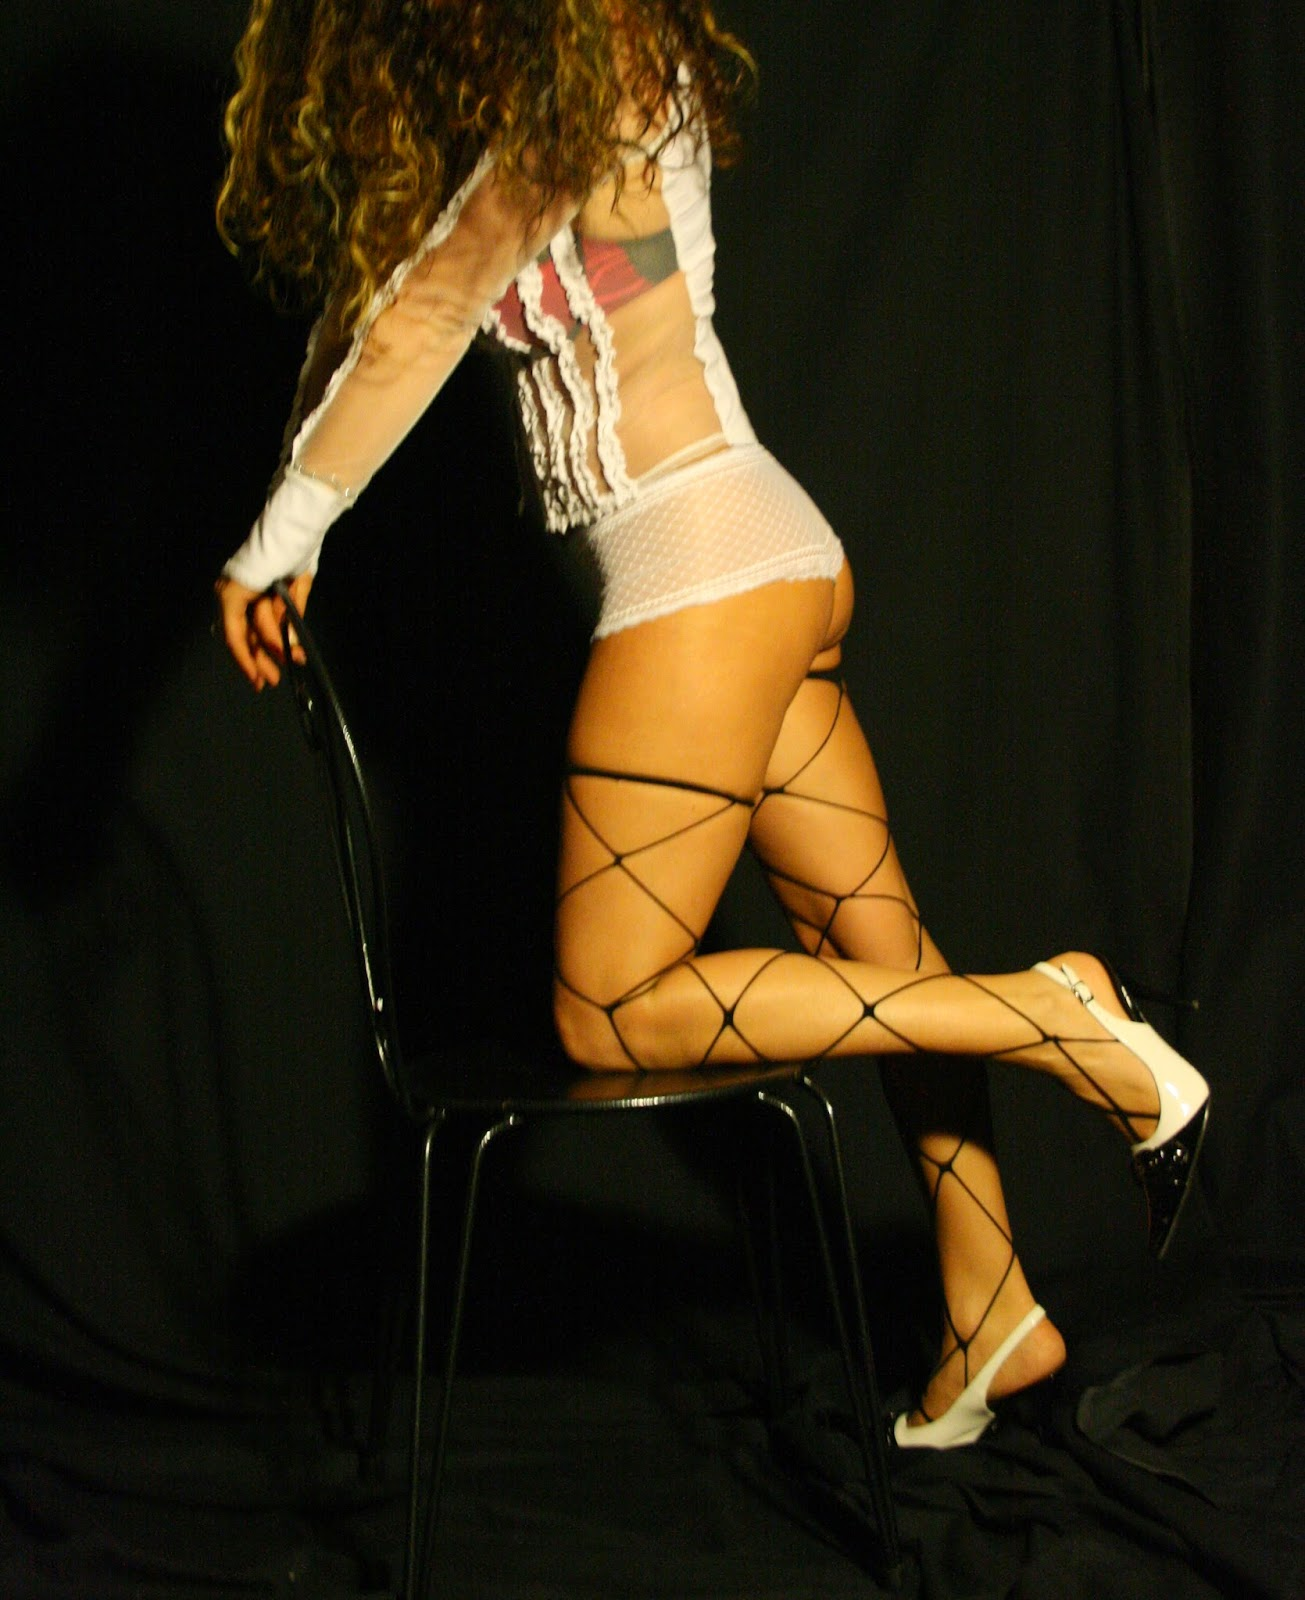 video femme nue escort girl franche comte